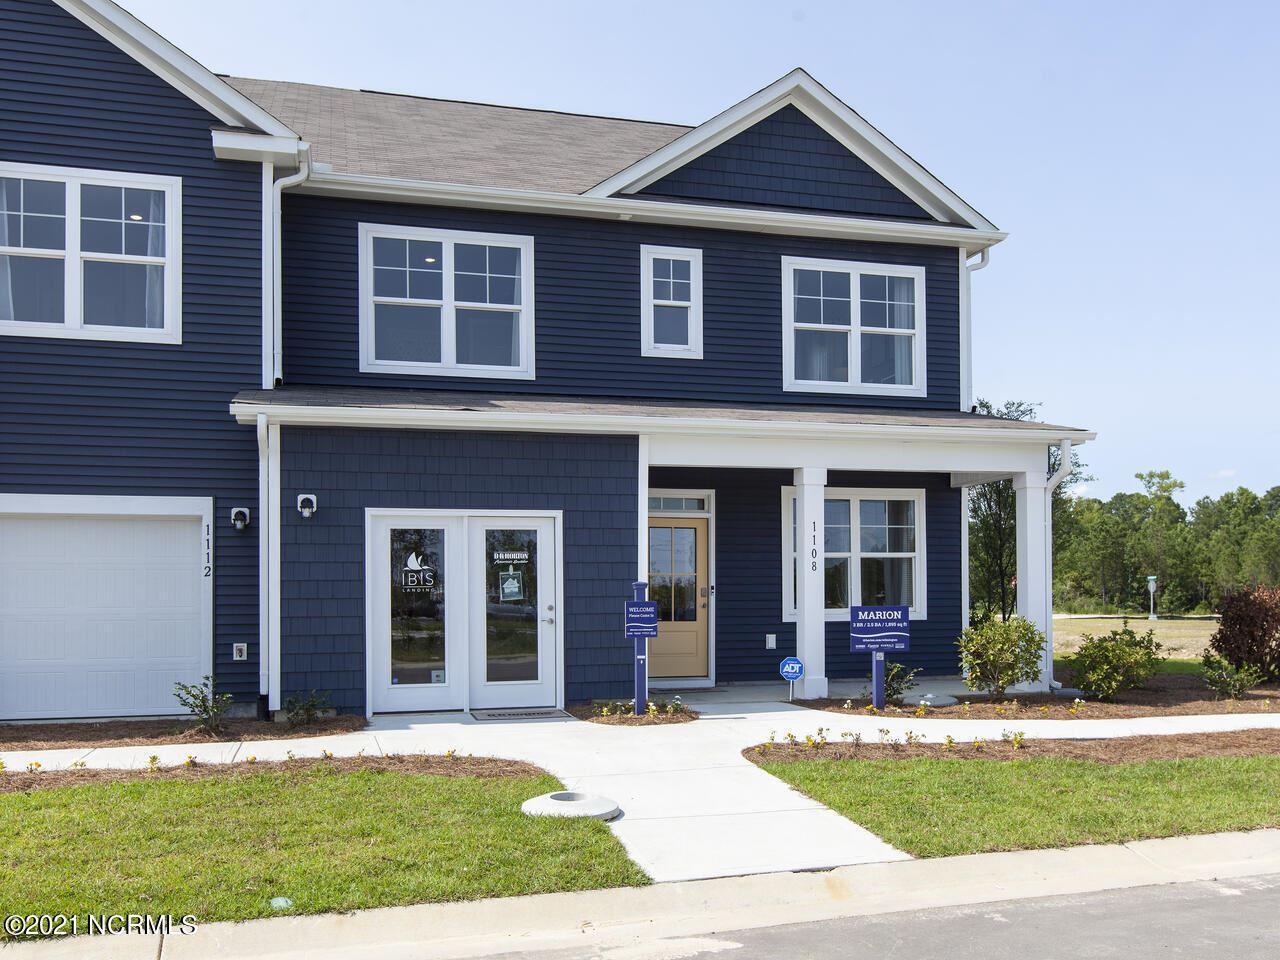 Photo of 7554 Knightbell Circle #Lot 59, Leland, NC 28451 (MLS # 100290091)